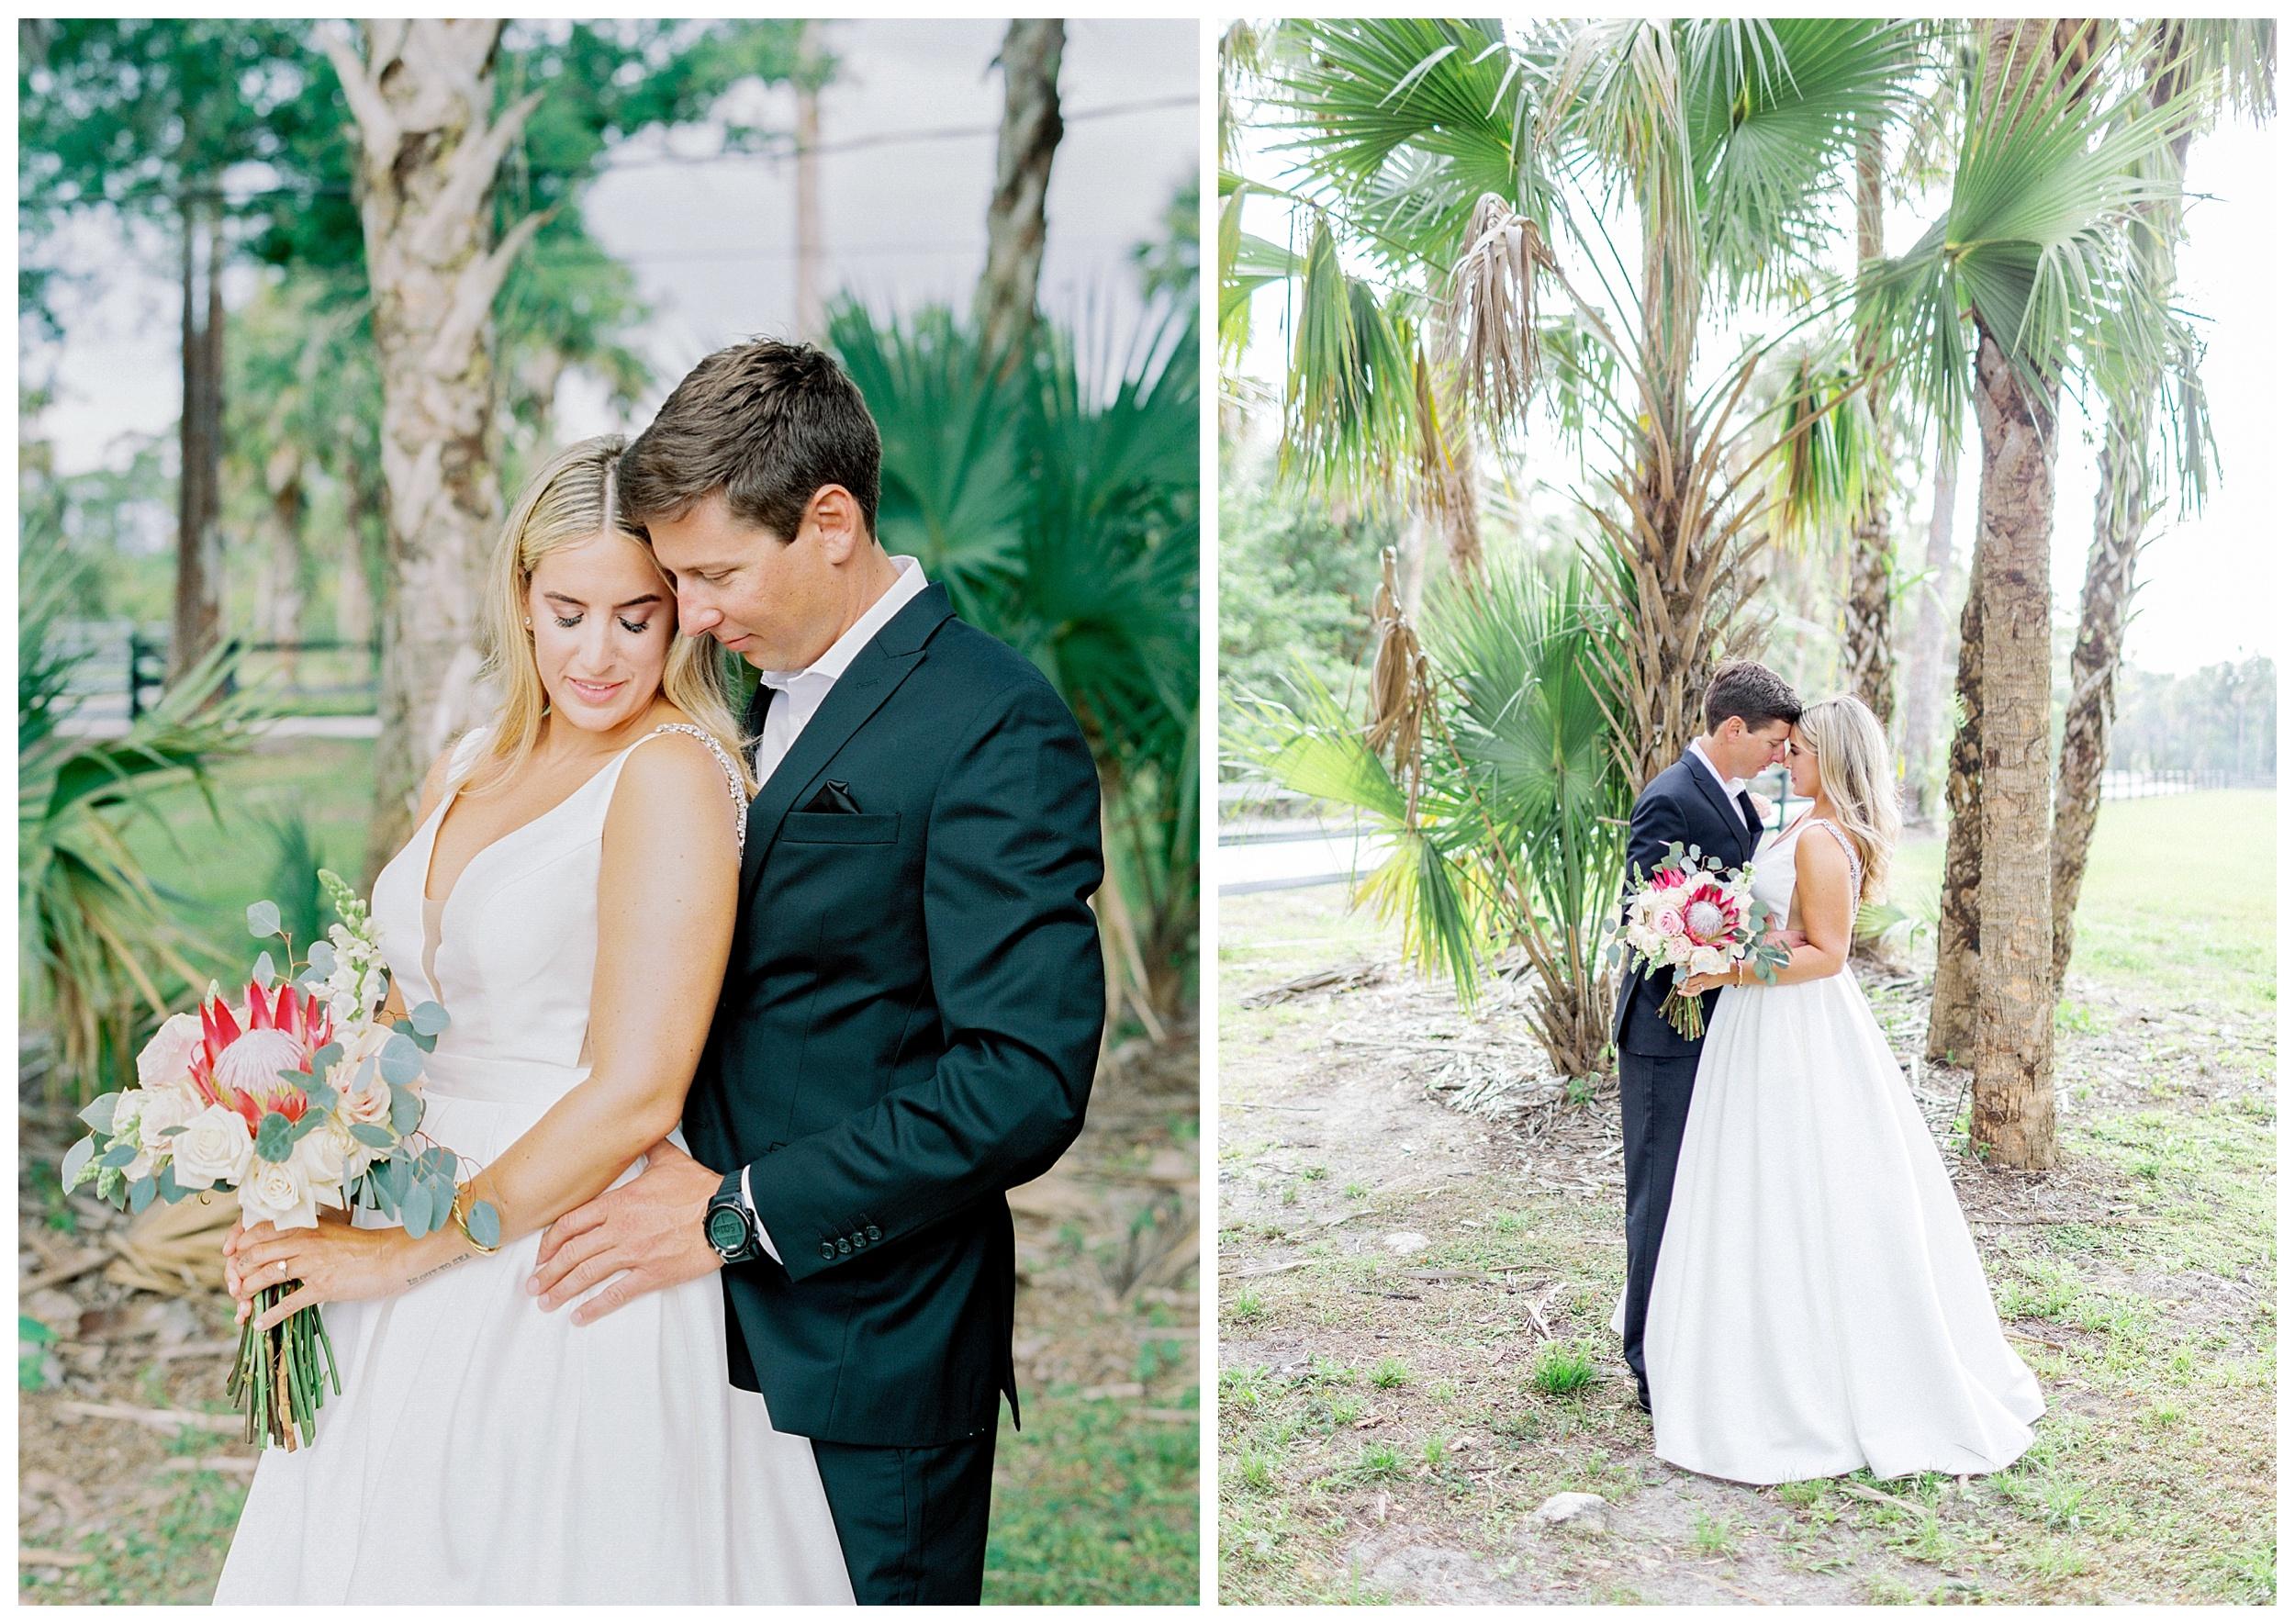 South Florida Wedding Photographer Kir Tuben_0051.jpg